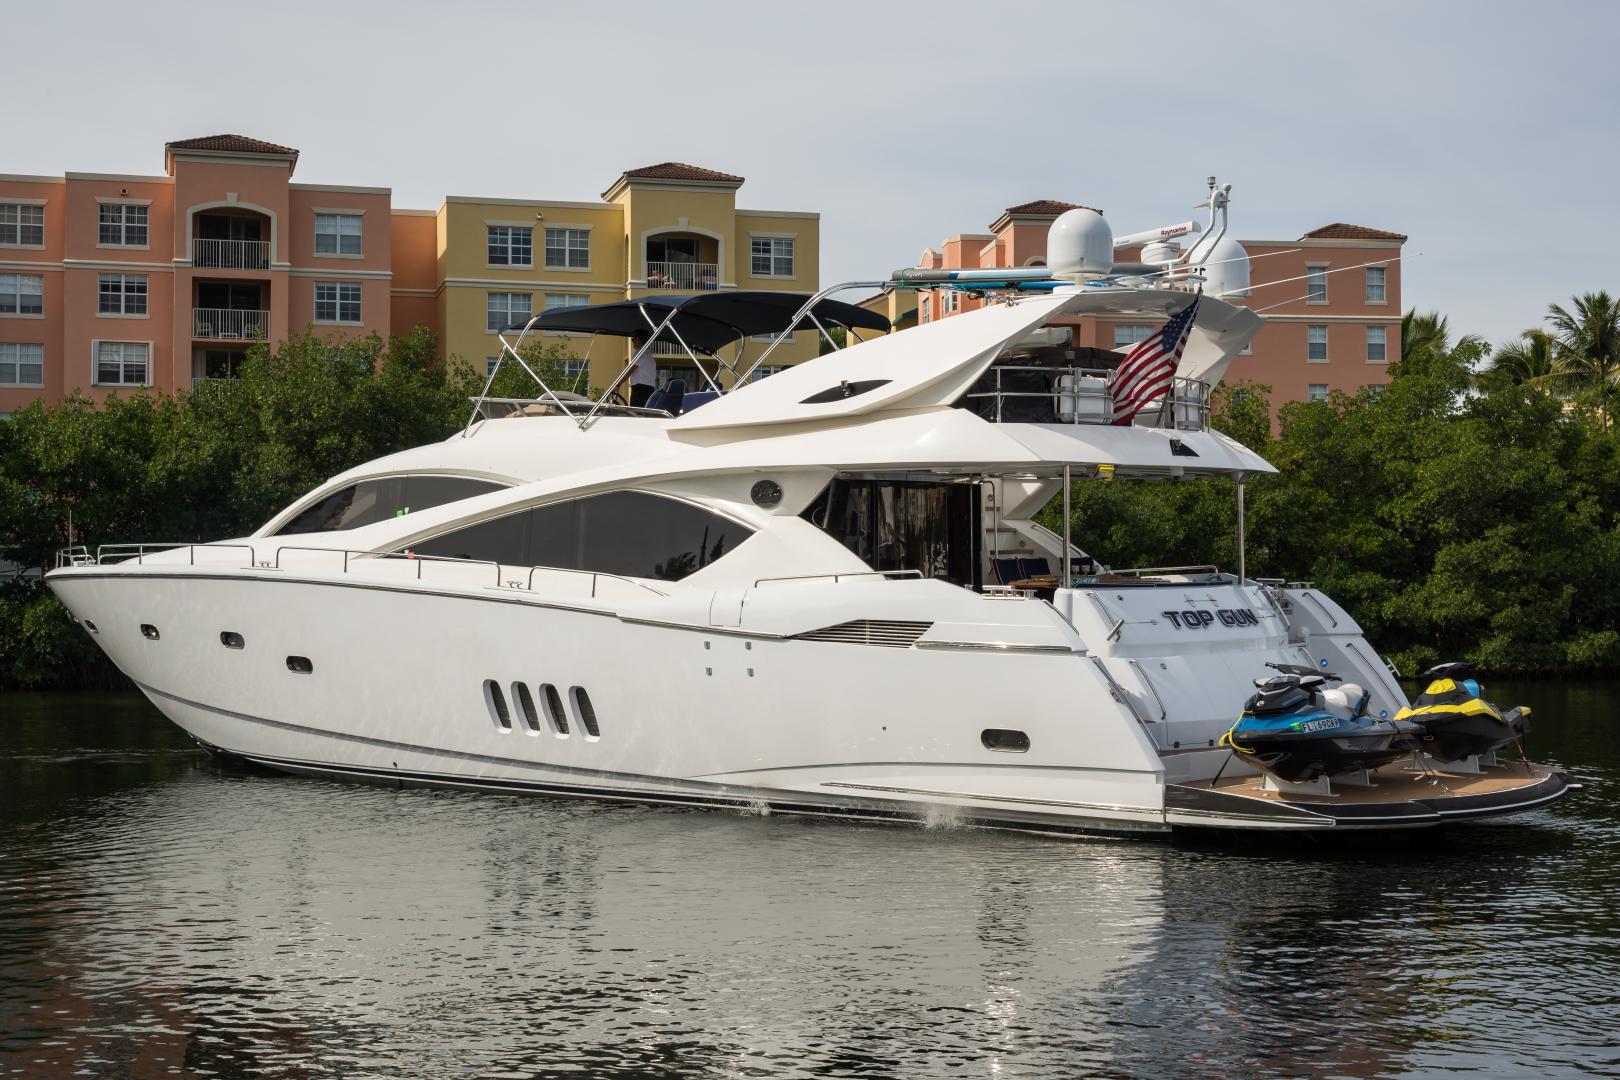 Sunseeker-Yacht 2004-TOP GUN Aventura-Florida-United States-1450741 | Thumbnail